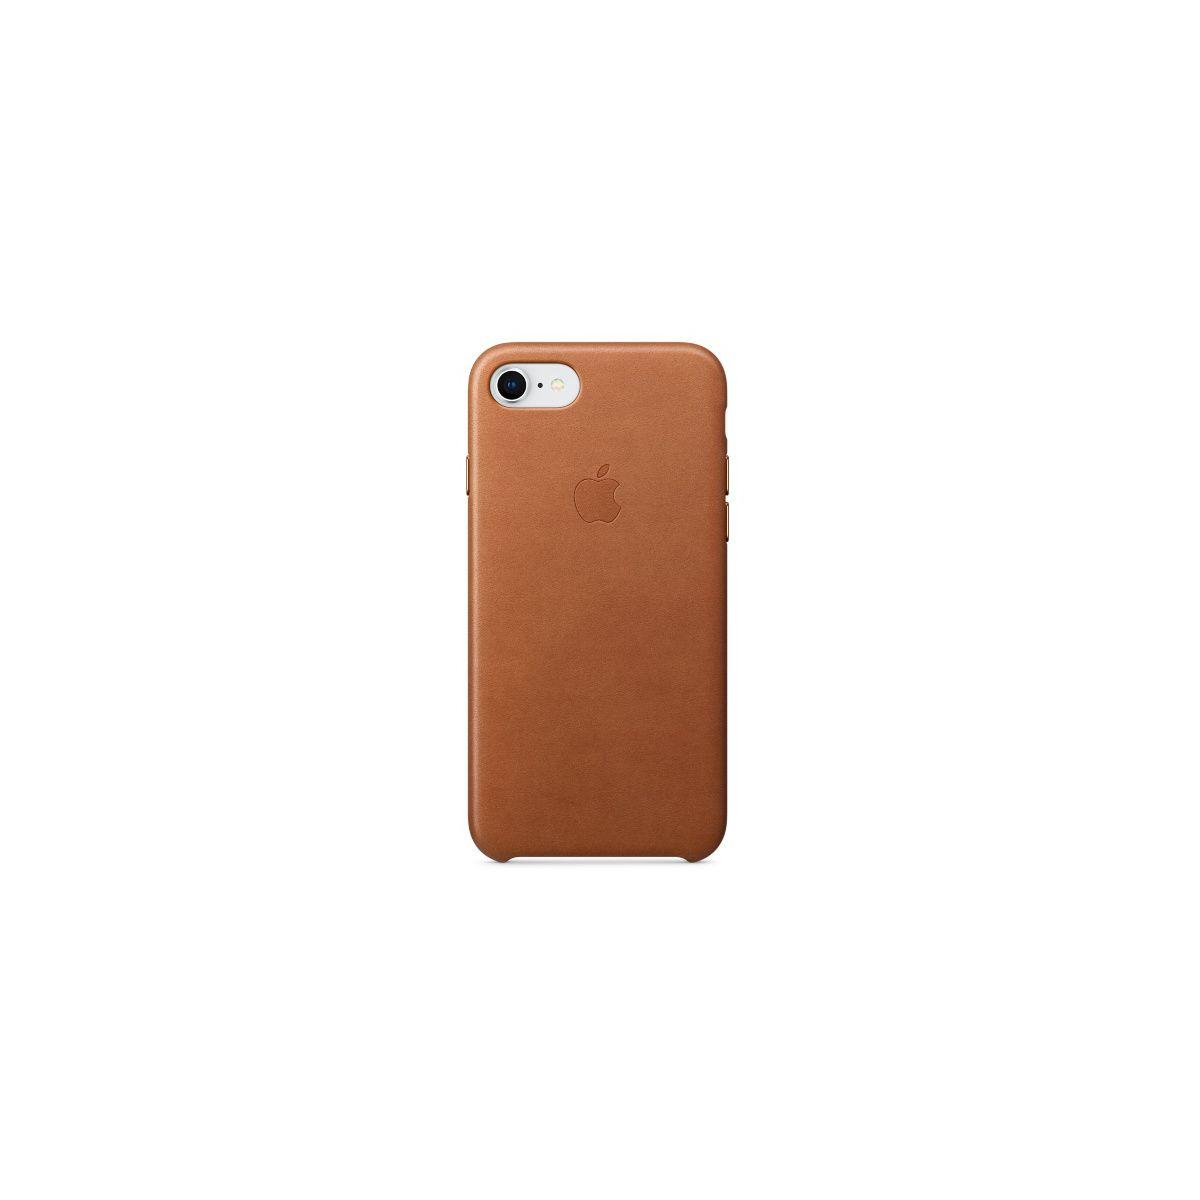 Coque APPLE iPhone 7/8 cuir havane (photo)